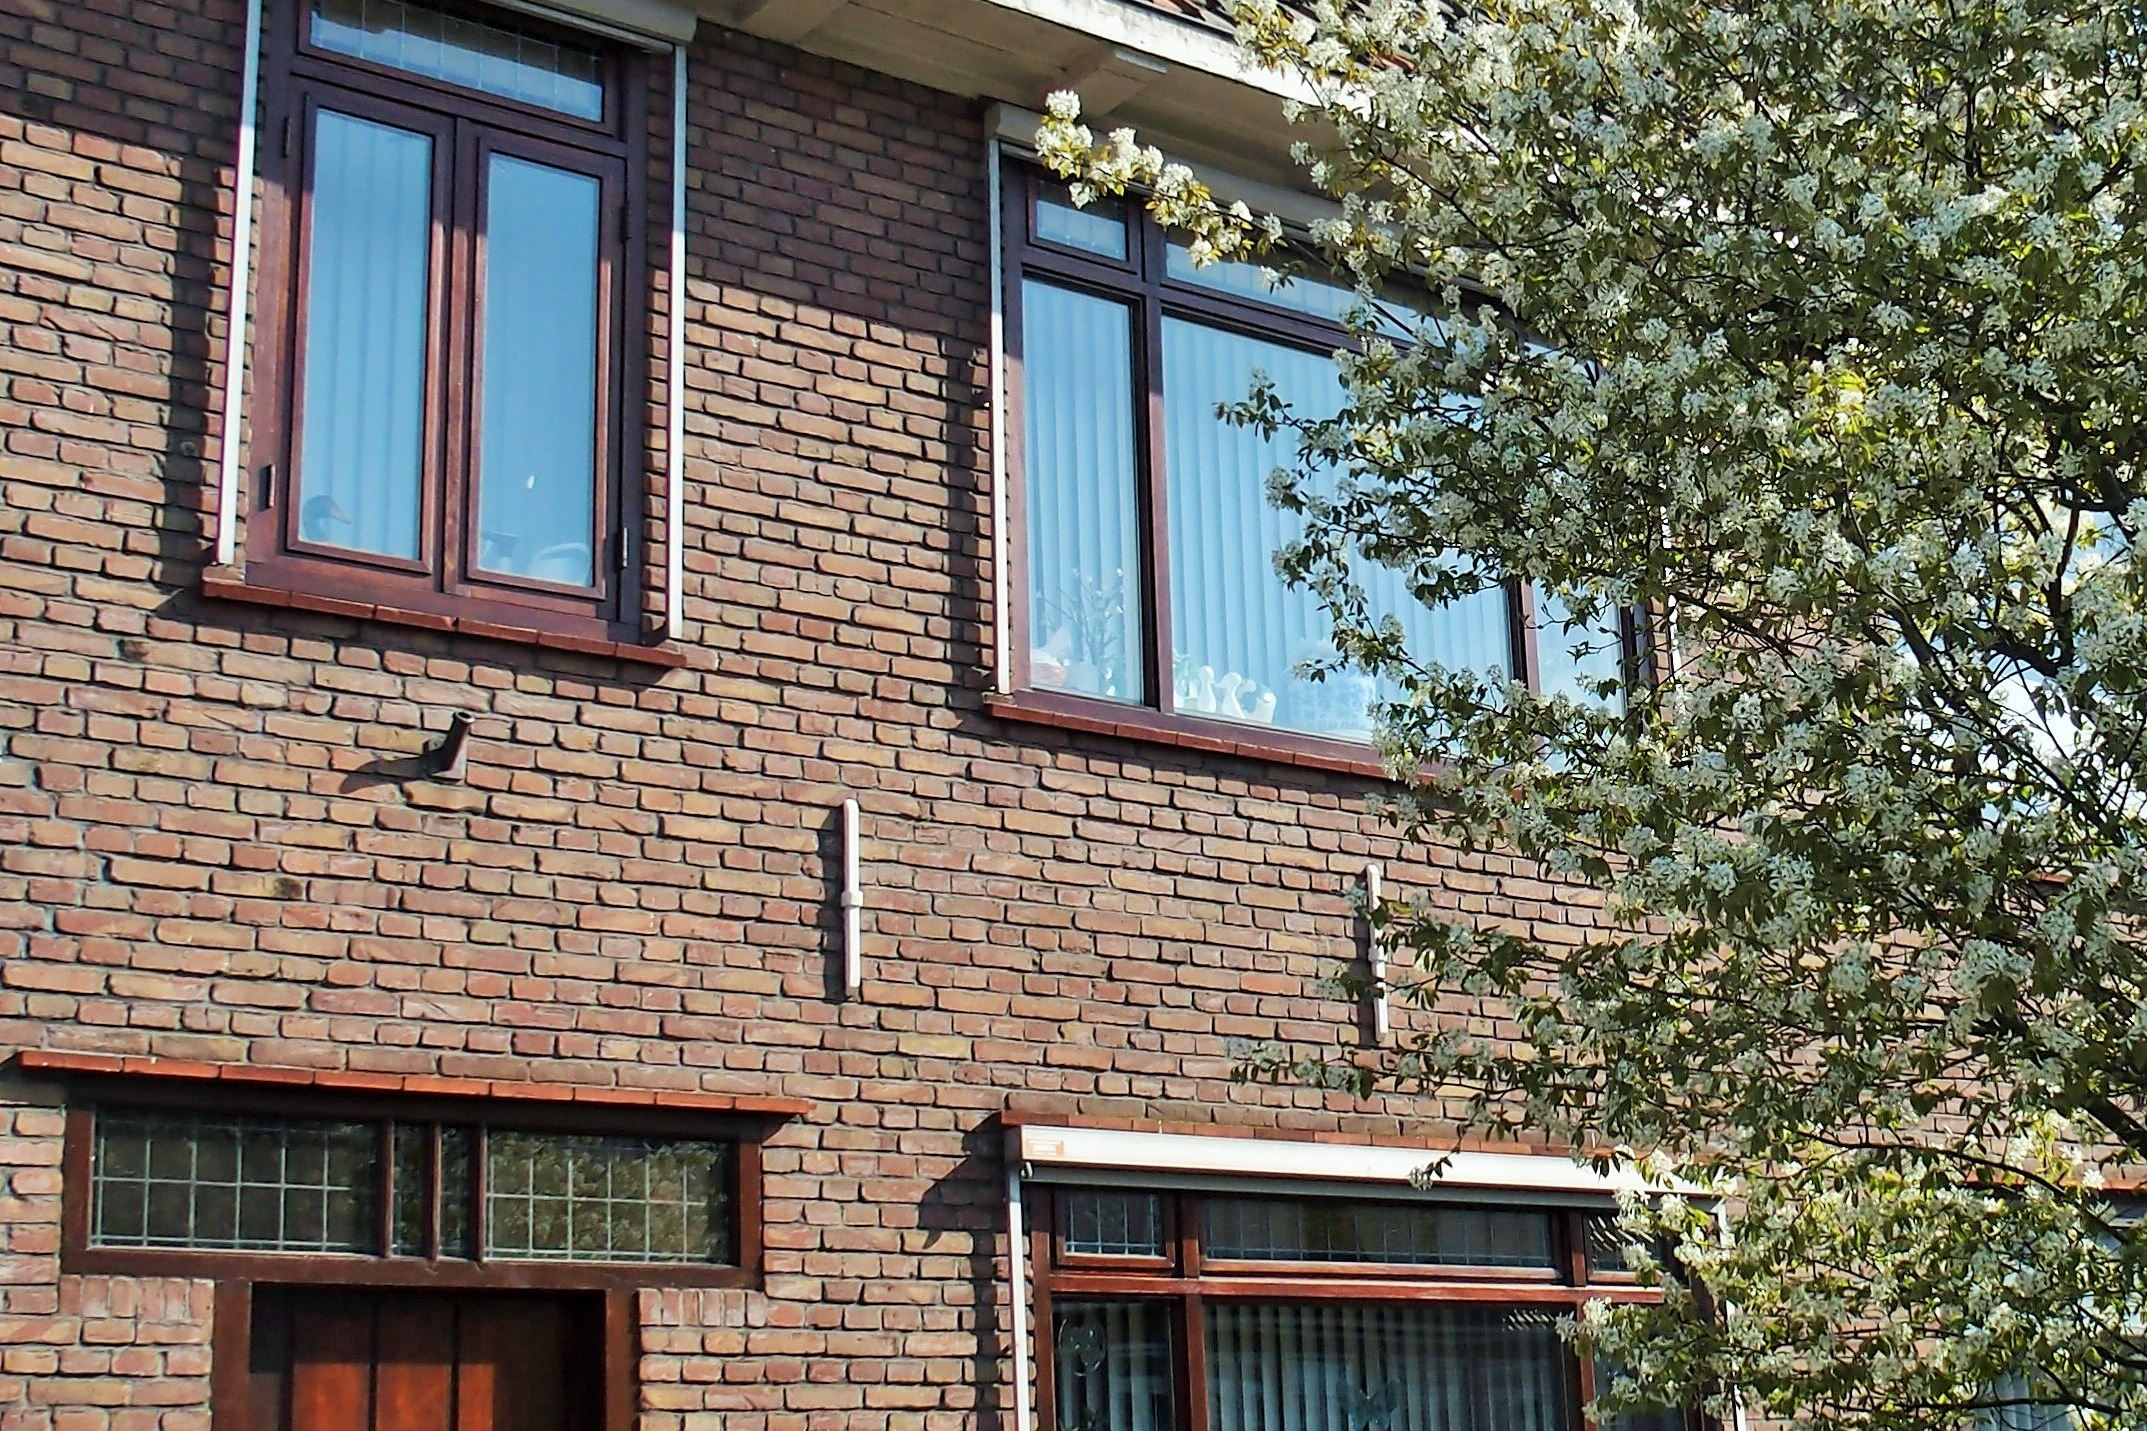 Huis te koop: rozenlaan 61 3051 ll rotterdam [funda]